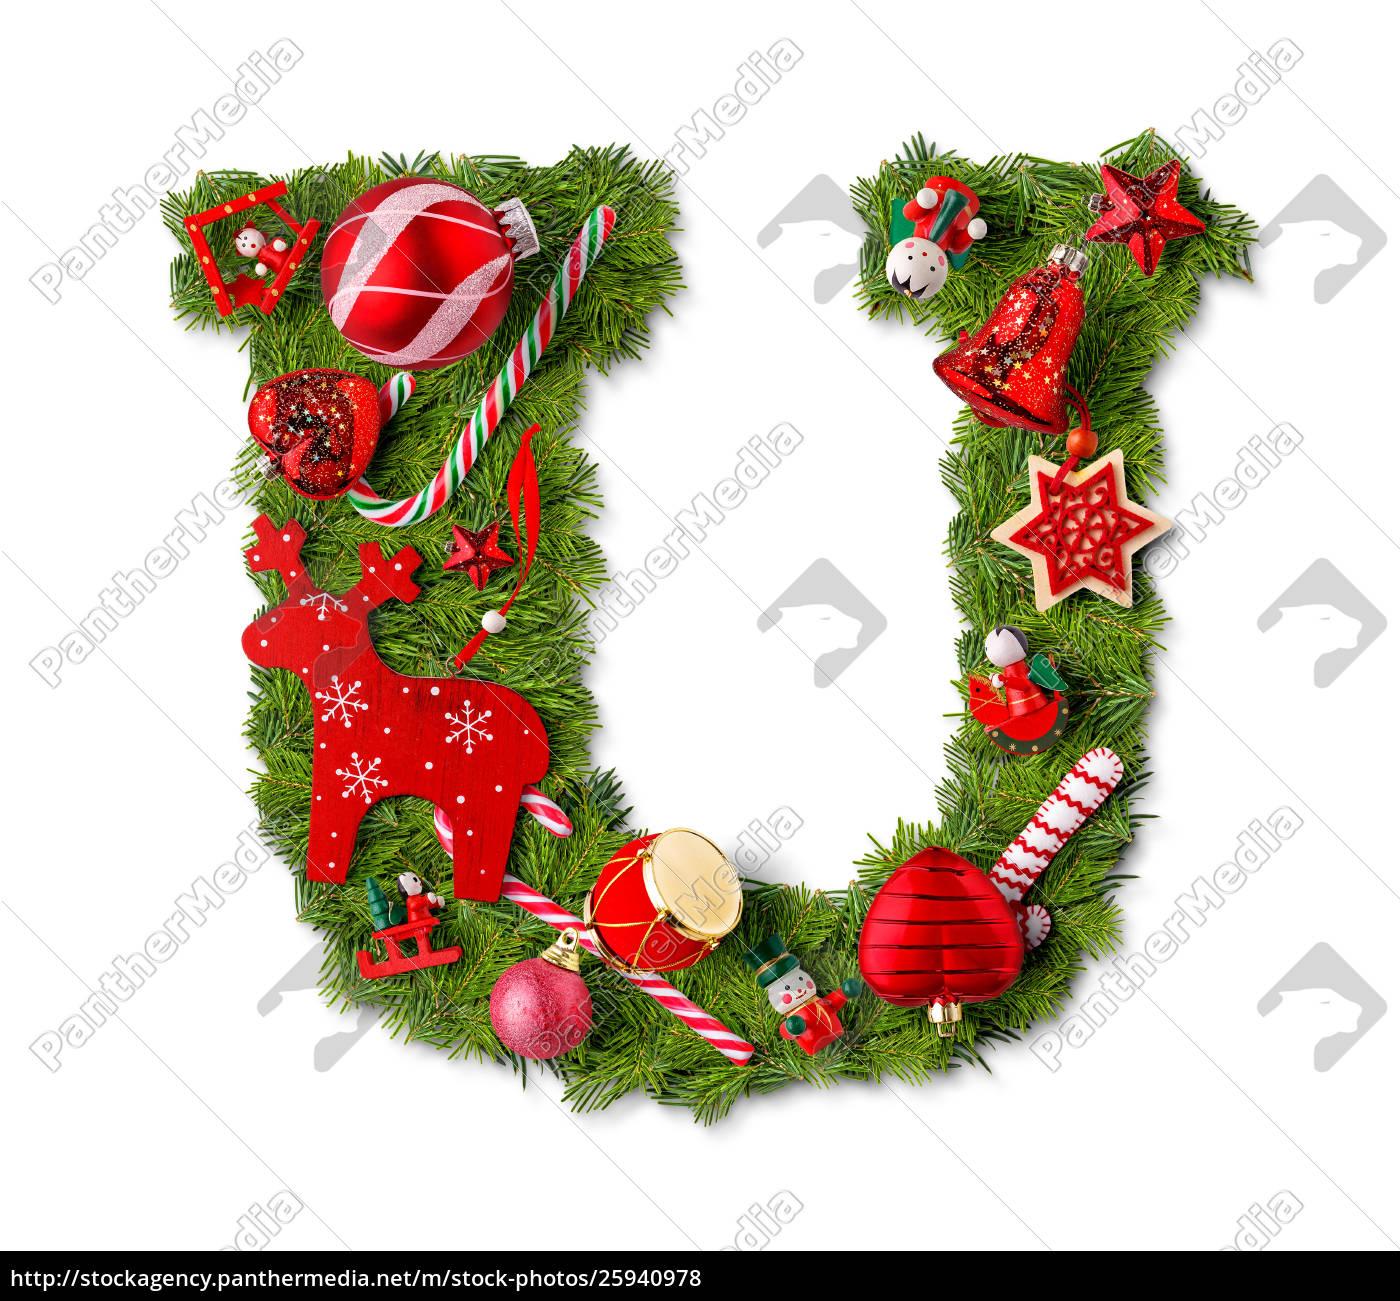 Christmas Alphabet.Stock Image 25940978 Christmas Alphabet Letter U